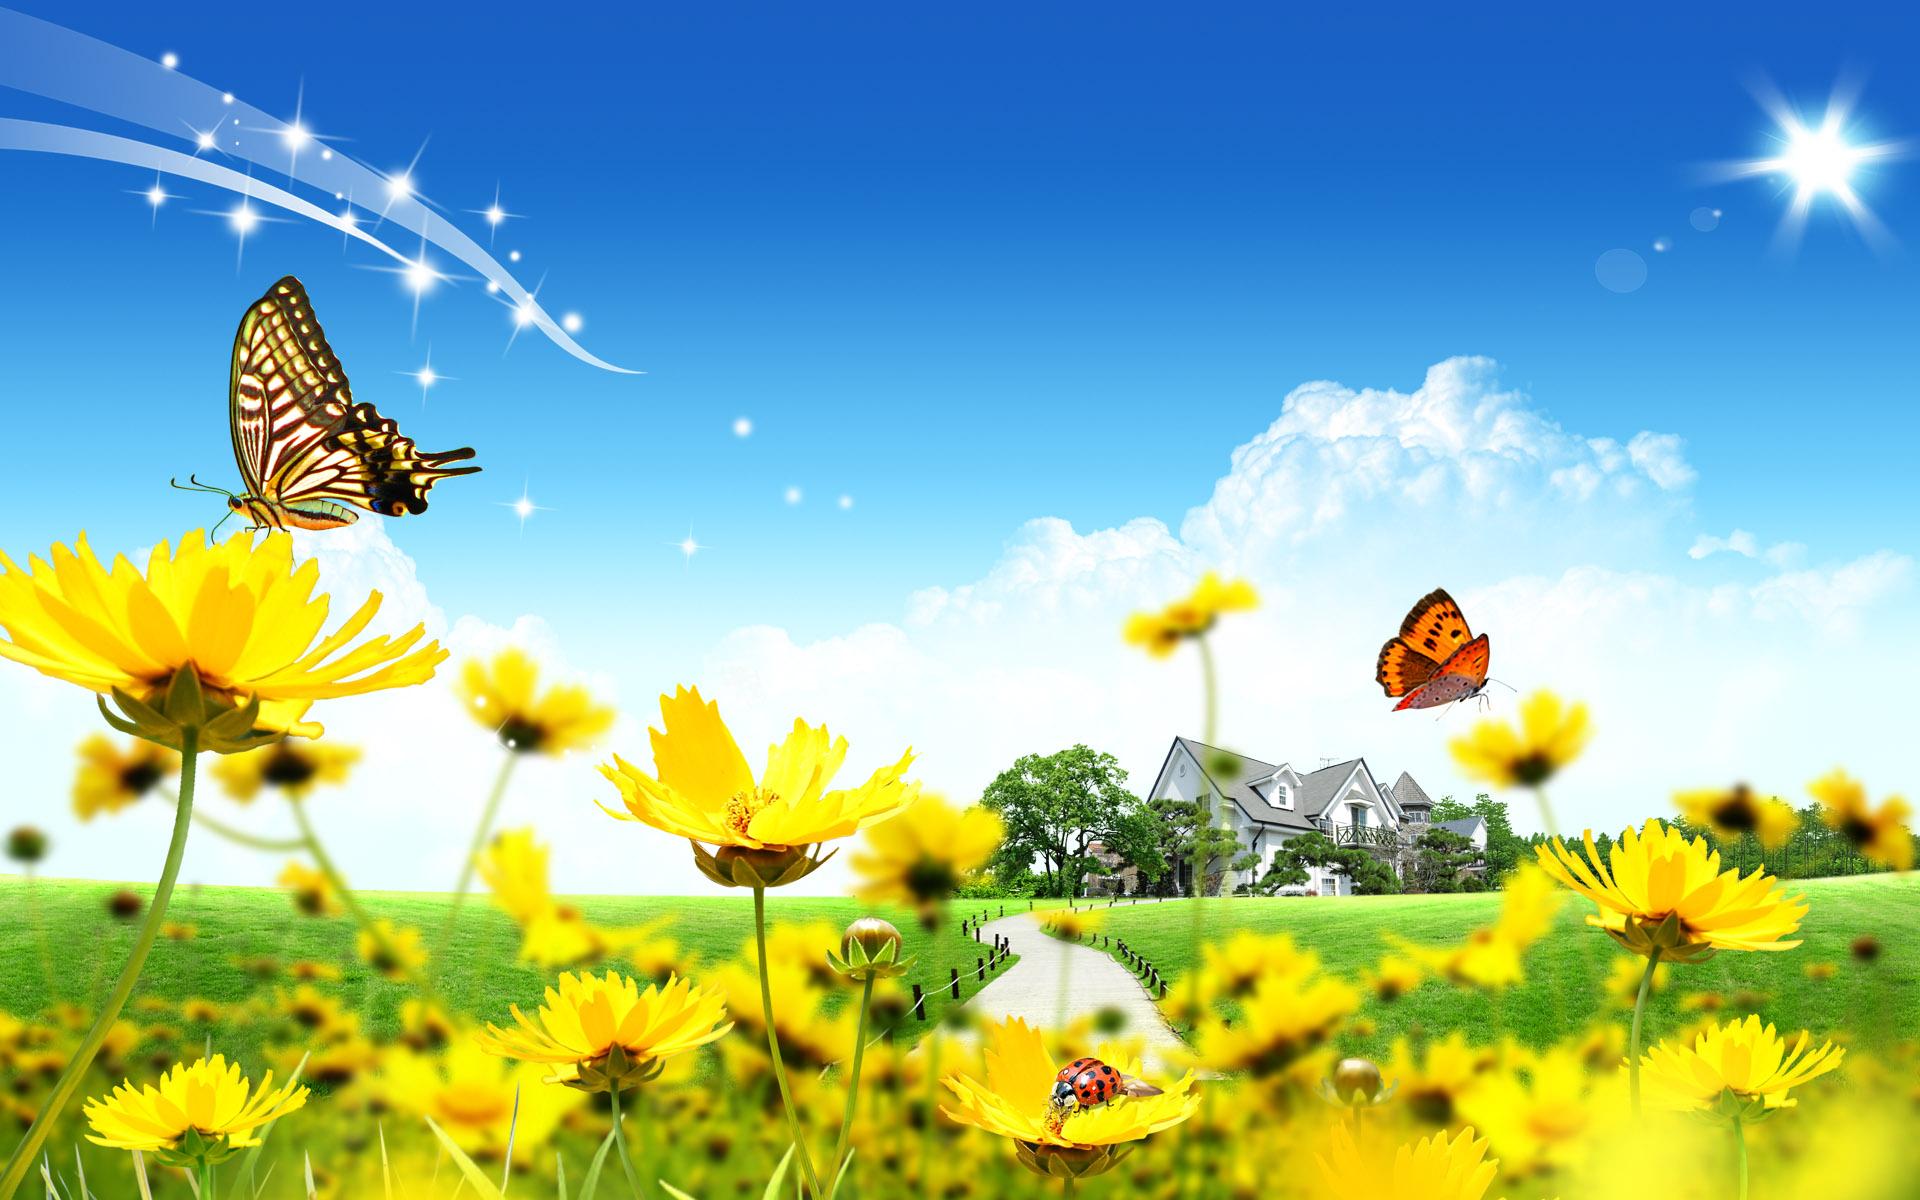 HD Wallpapers summer fantasy landscape for desktop wallpaper 1920x1200